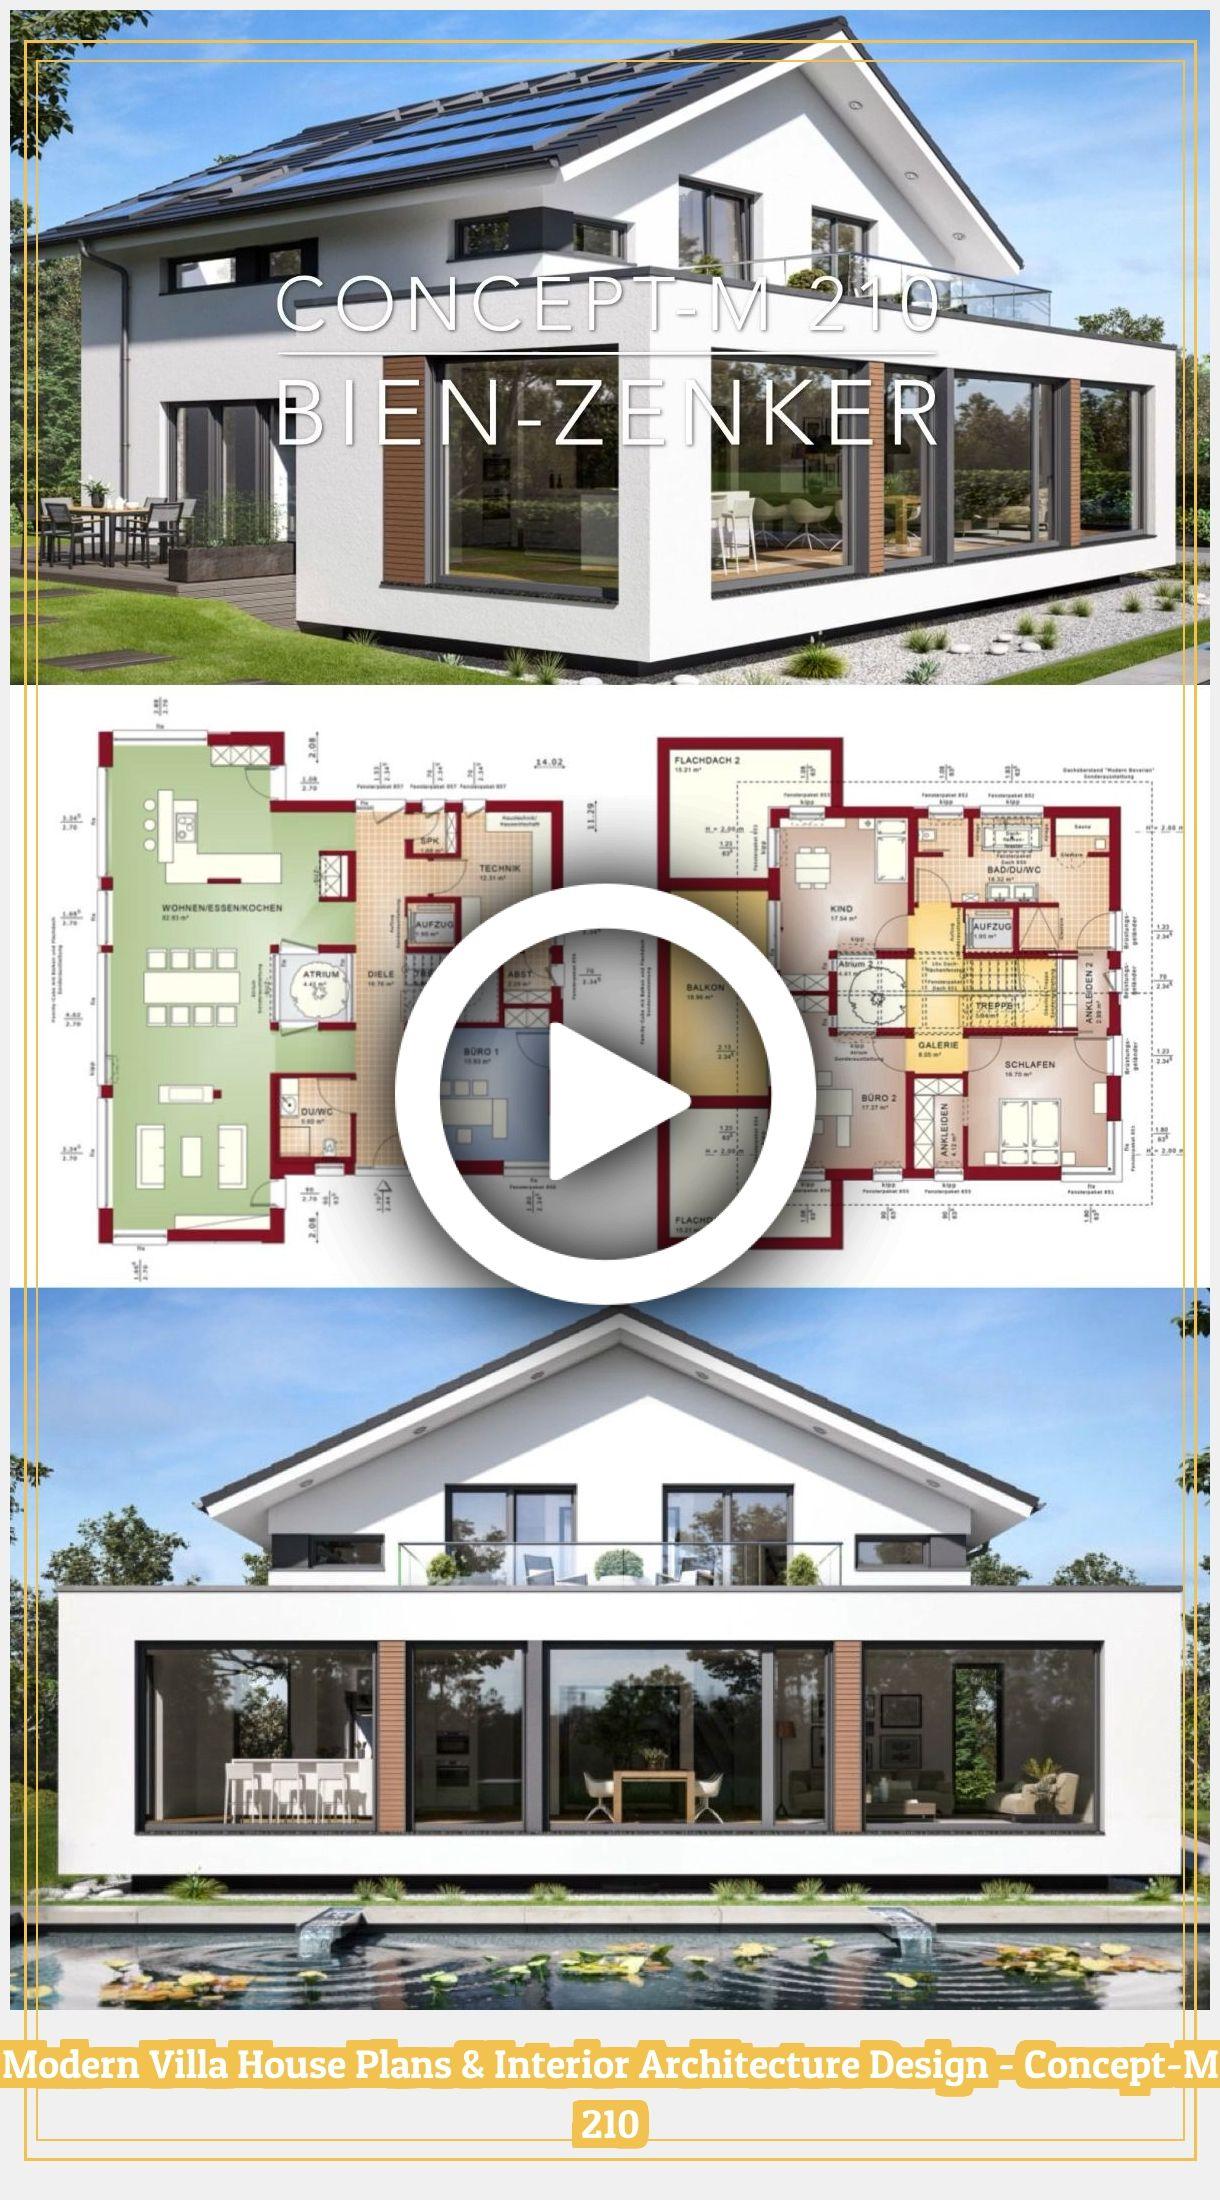 Modern House Plans 97684 Modern Luxury Villa Architecture House Plans Concept M 210 In 2020 Modern House Plans Architecture Design Concept Interior Architecture Design